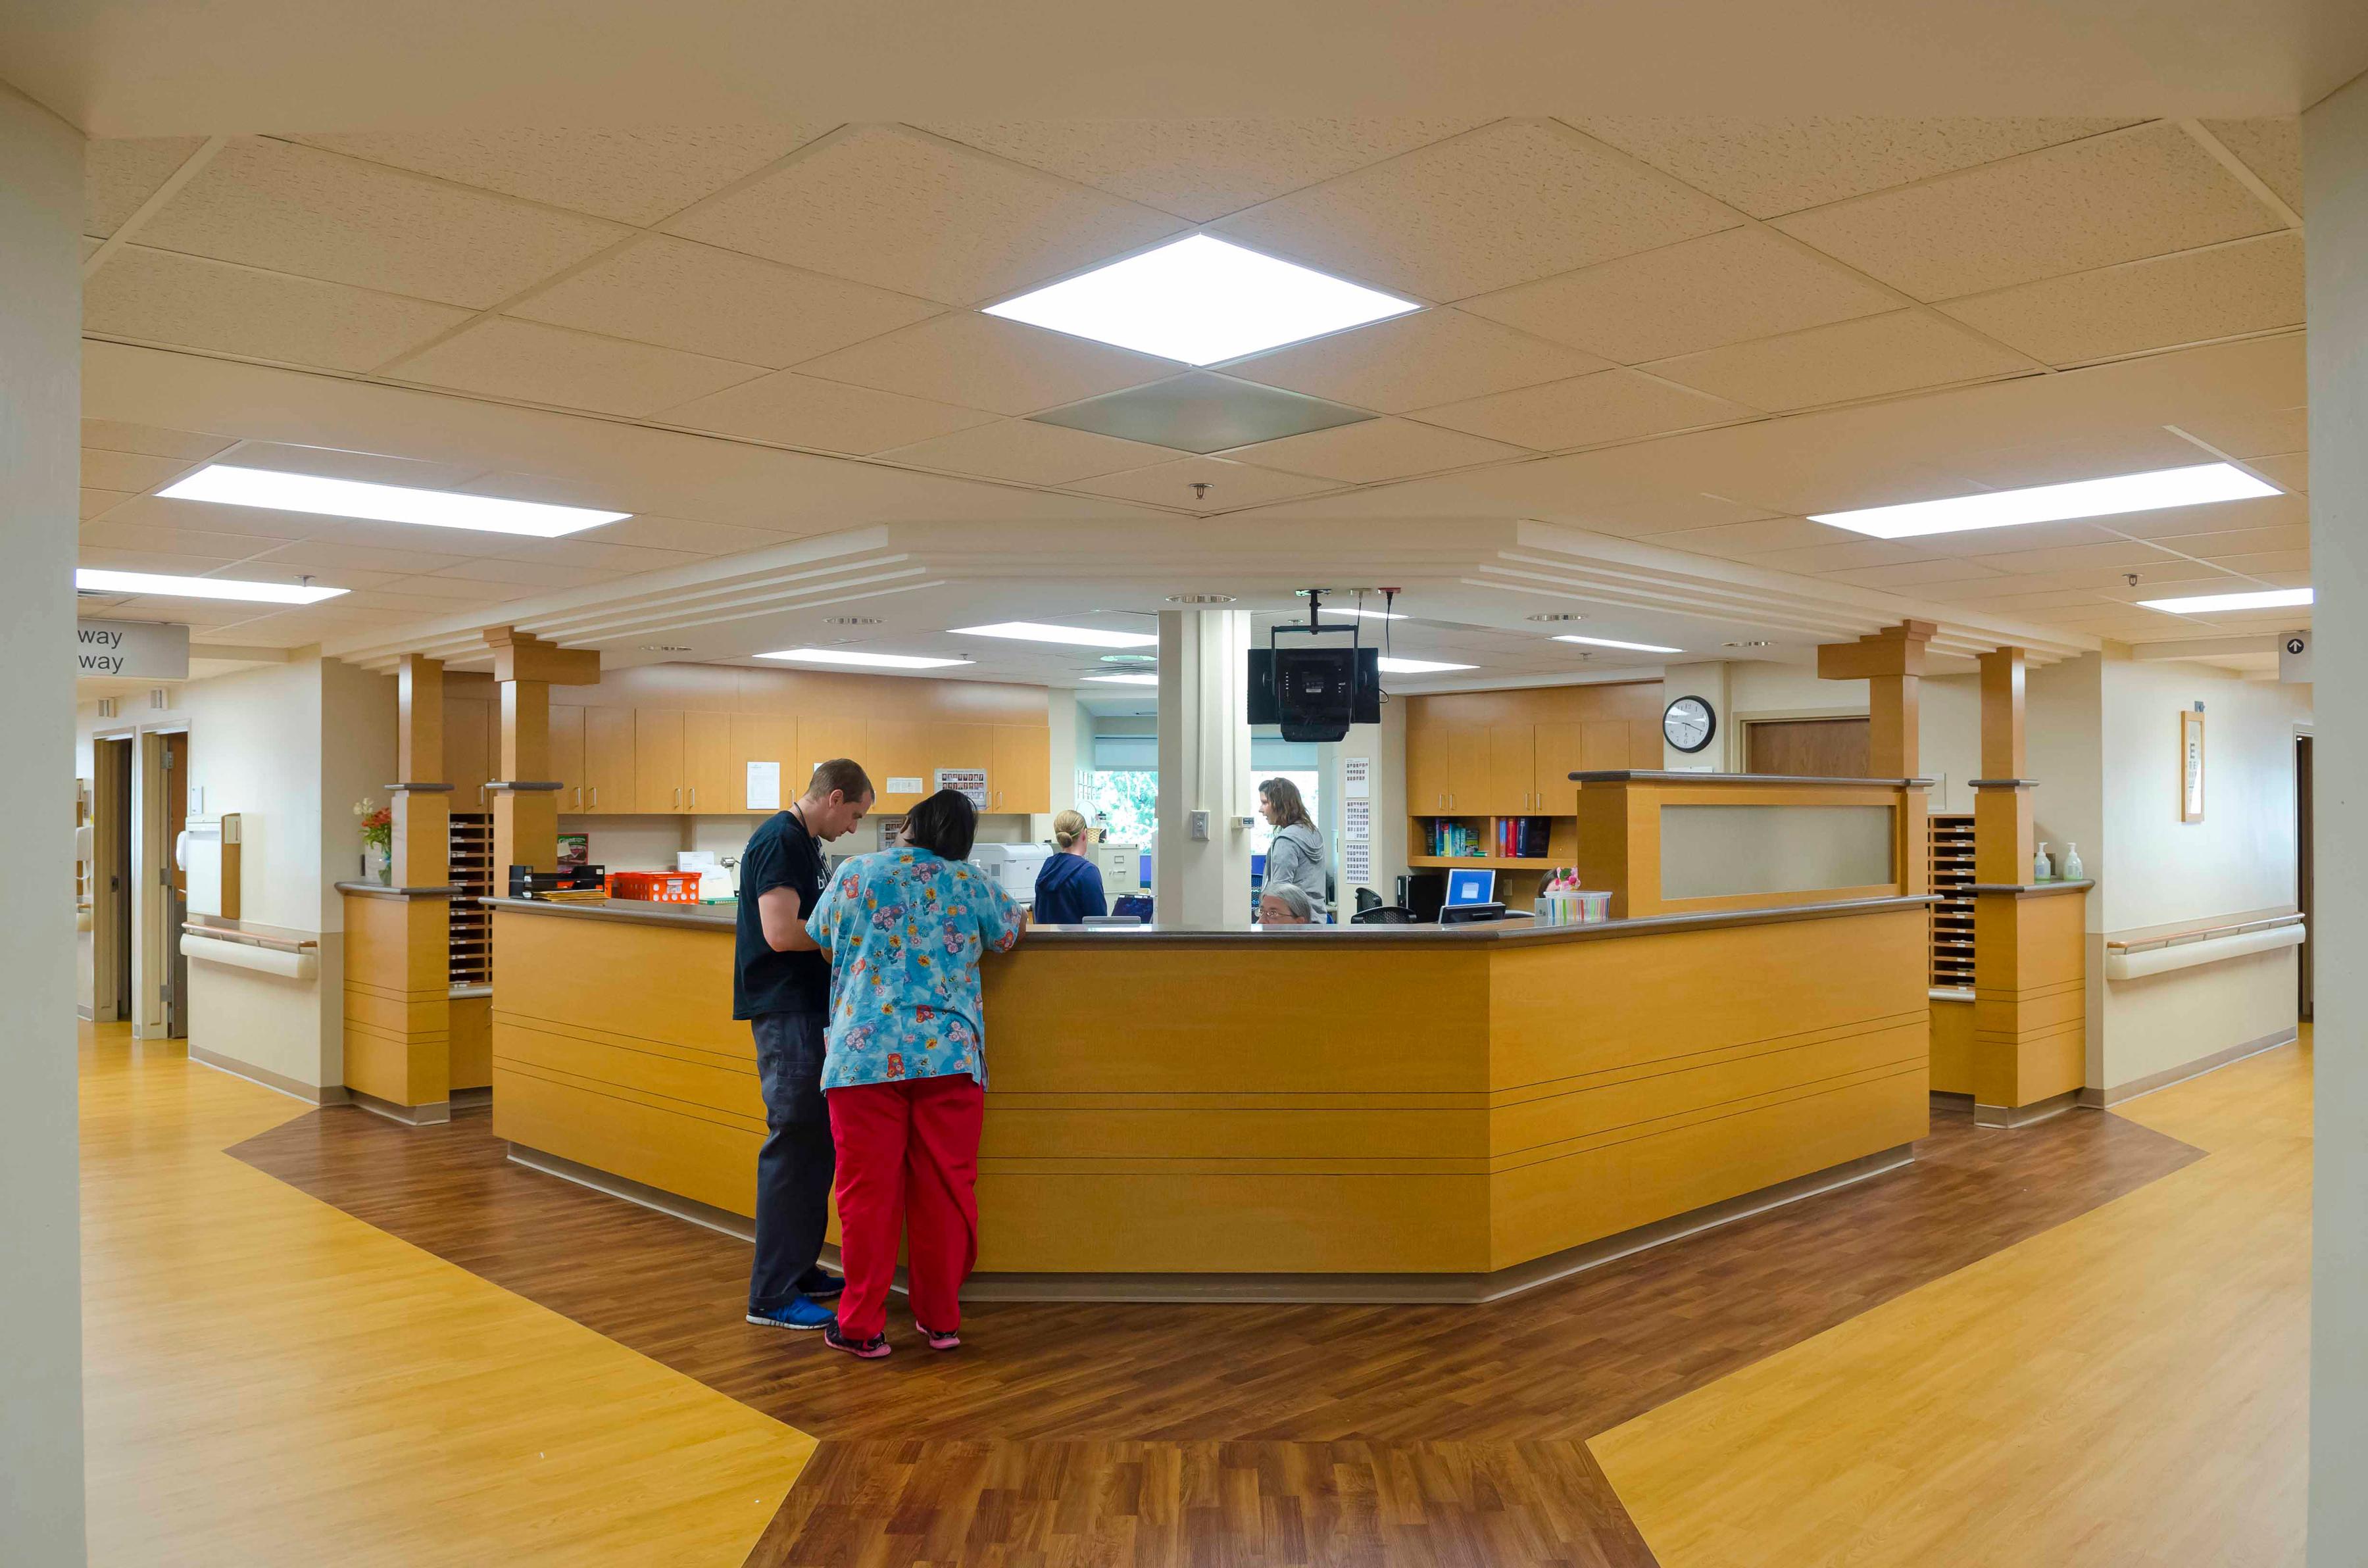 Broadlawns Medical Center 1801 Hickman Rd Des Moines Ia 50314 Yp Com